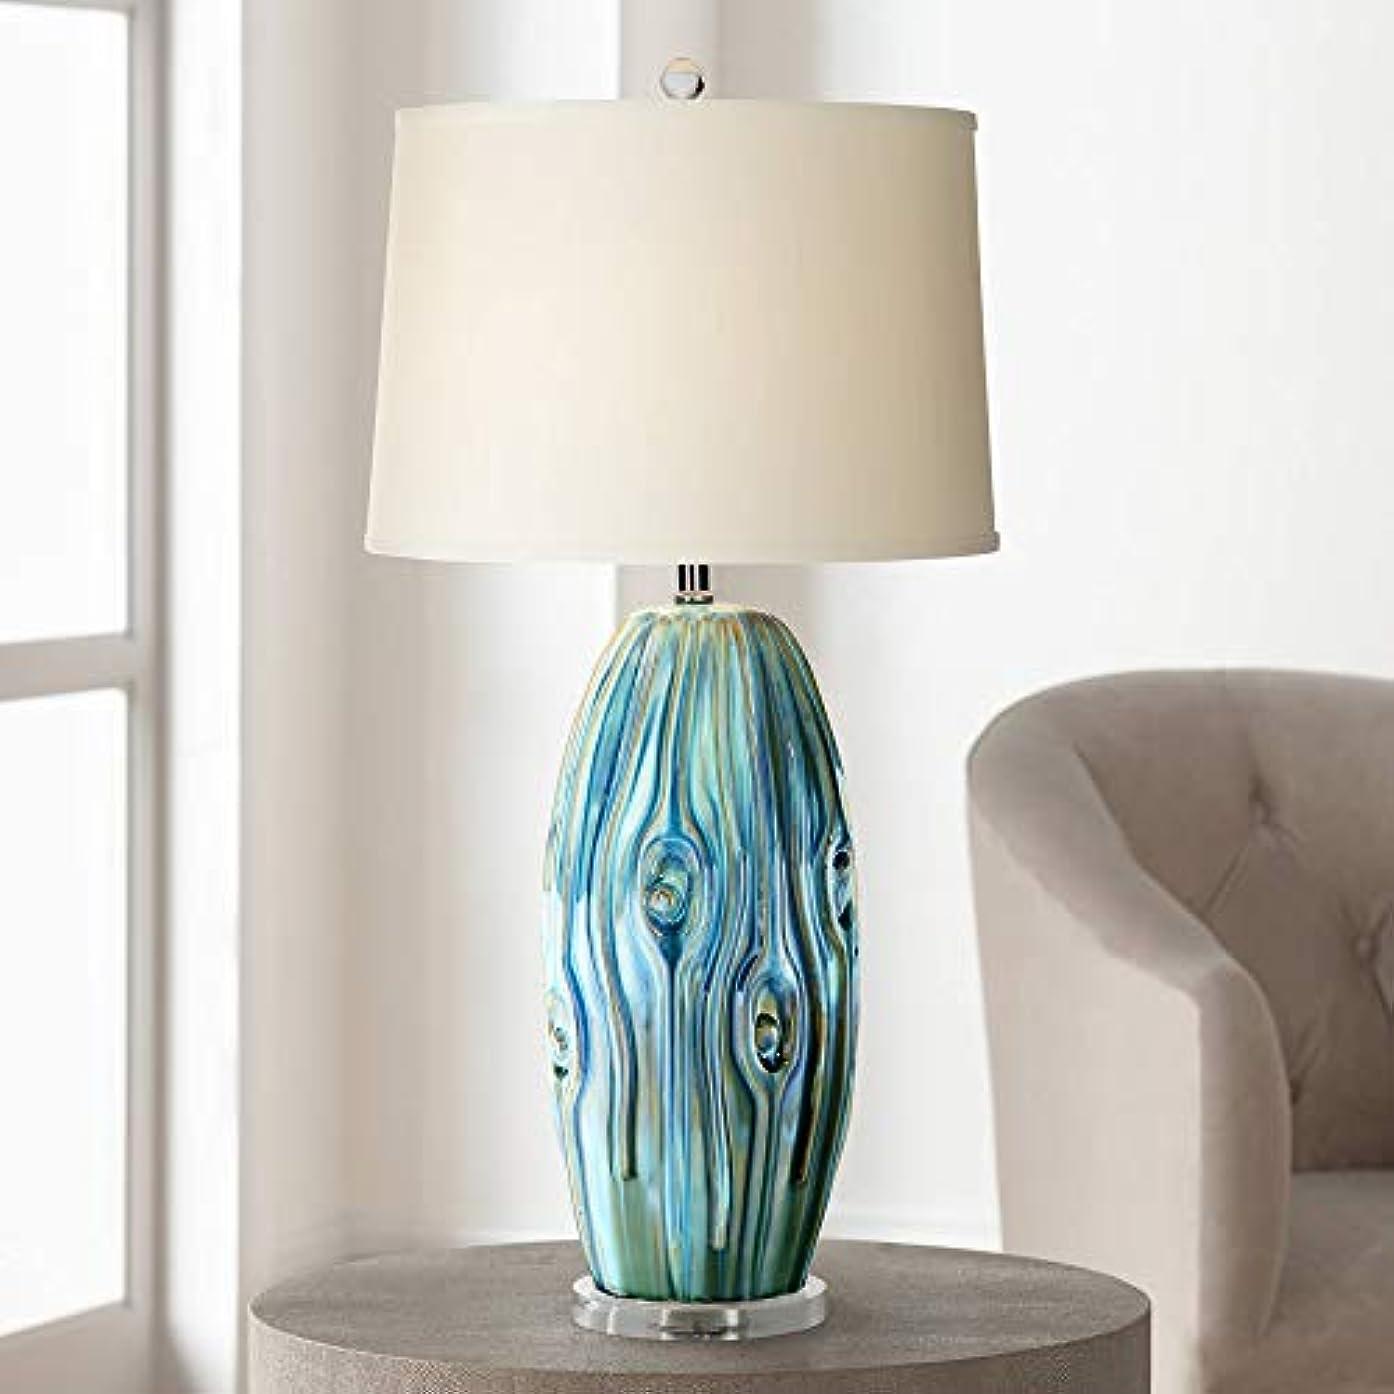 Eneya Coastal Table Lamp Ceramic Blue Green Swirl Glaze Neutral Oval Shade for Living Room Family Bedroom Bedside - Possini Euro Design